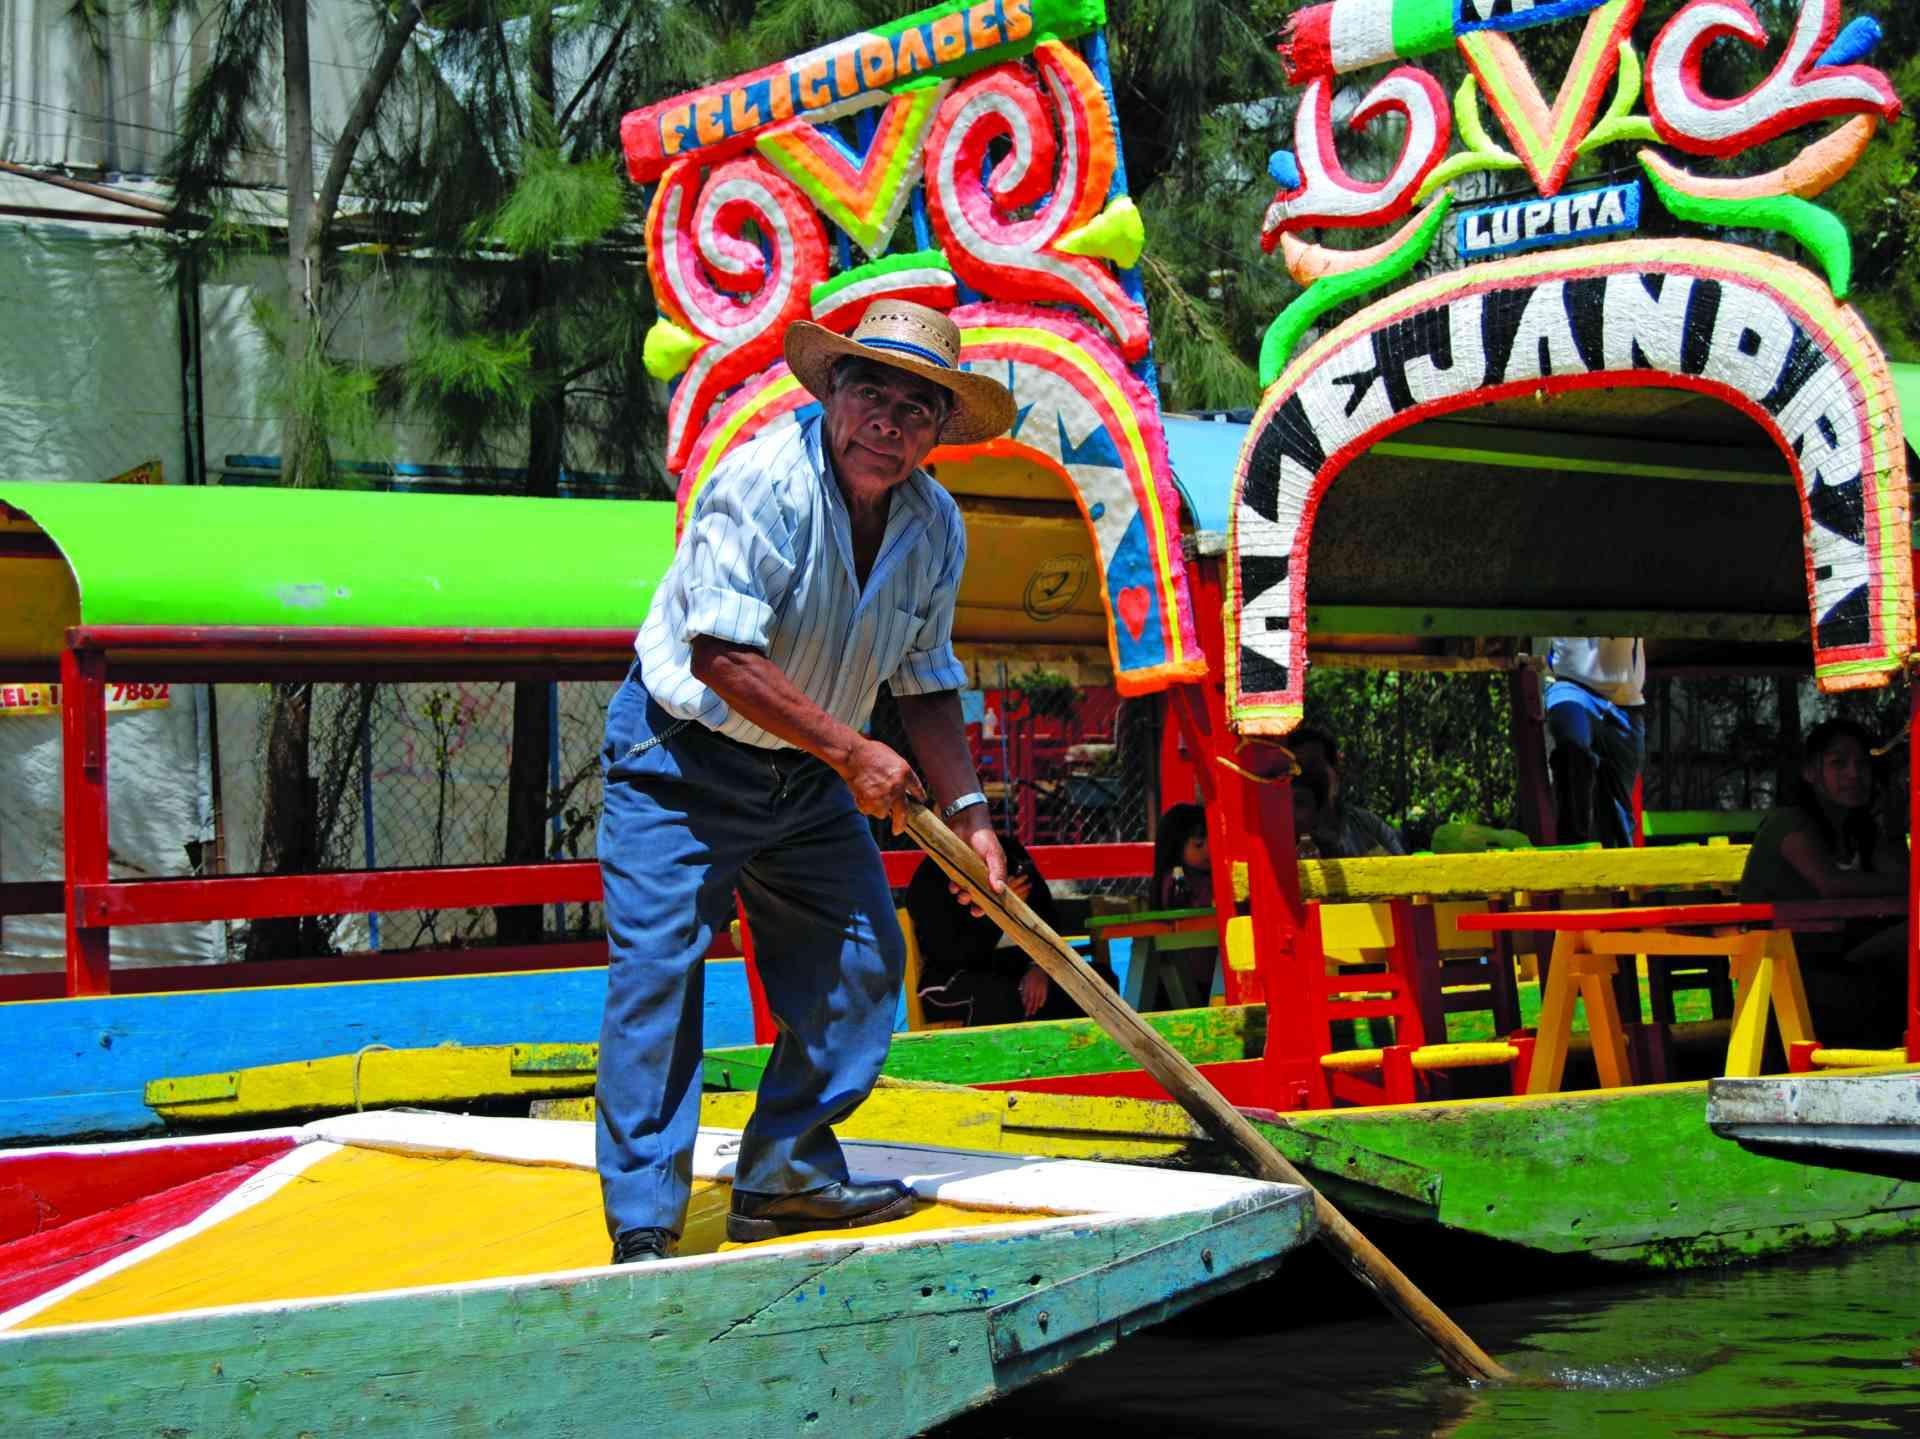 Trajinera in Xochimilco, Mexico